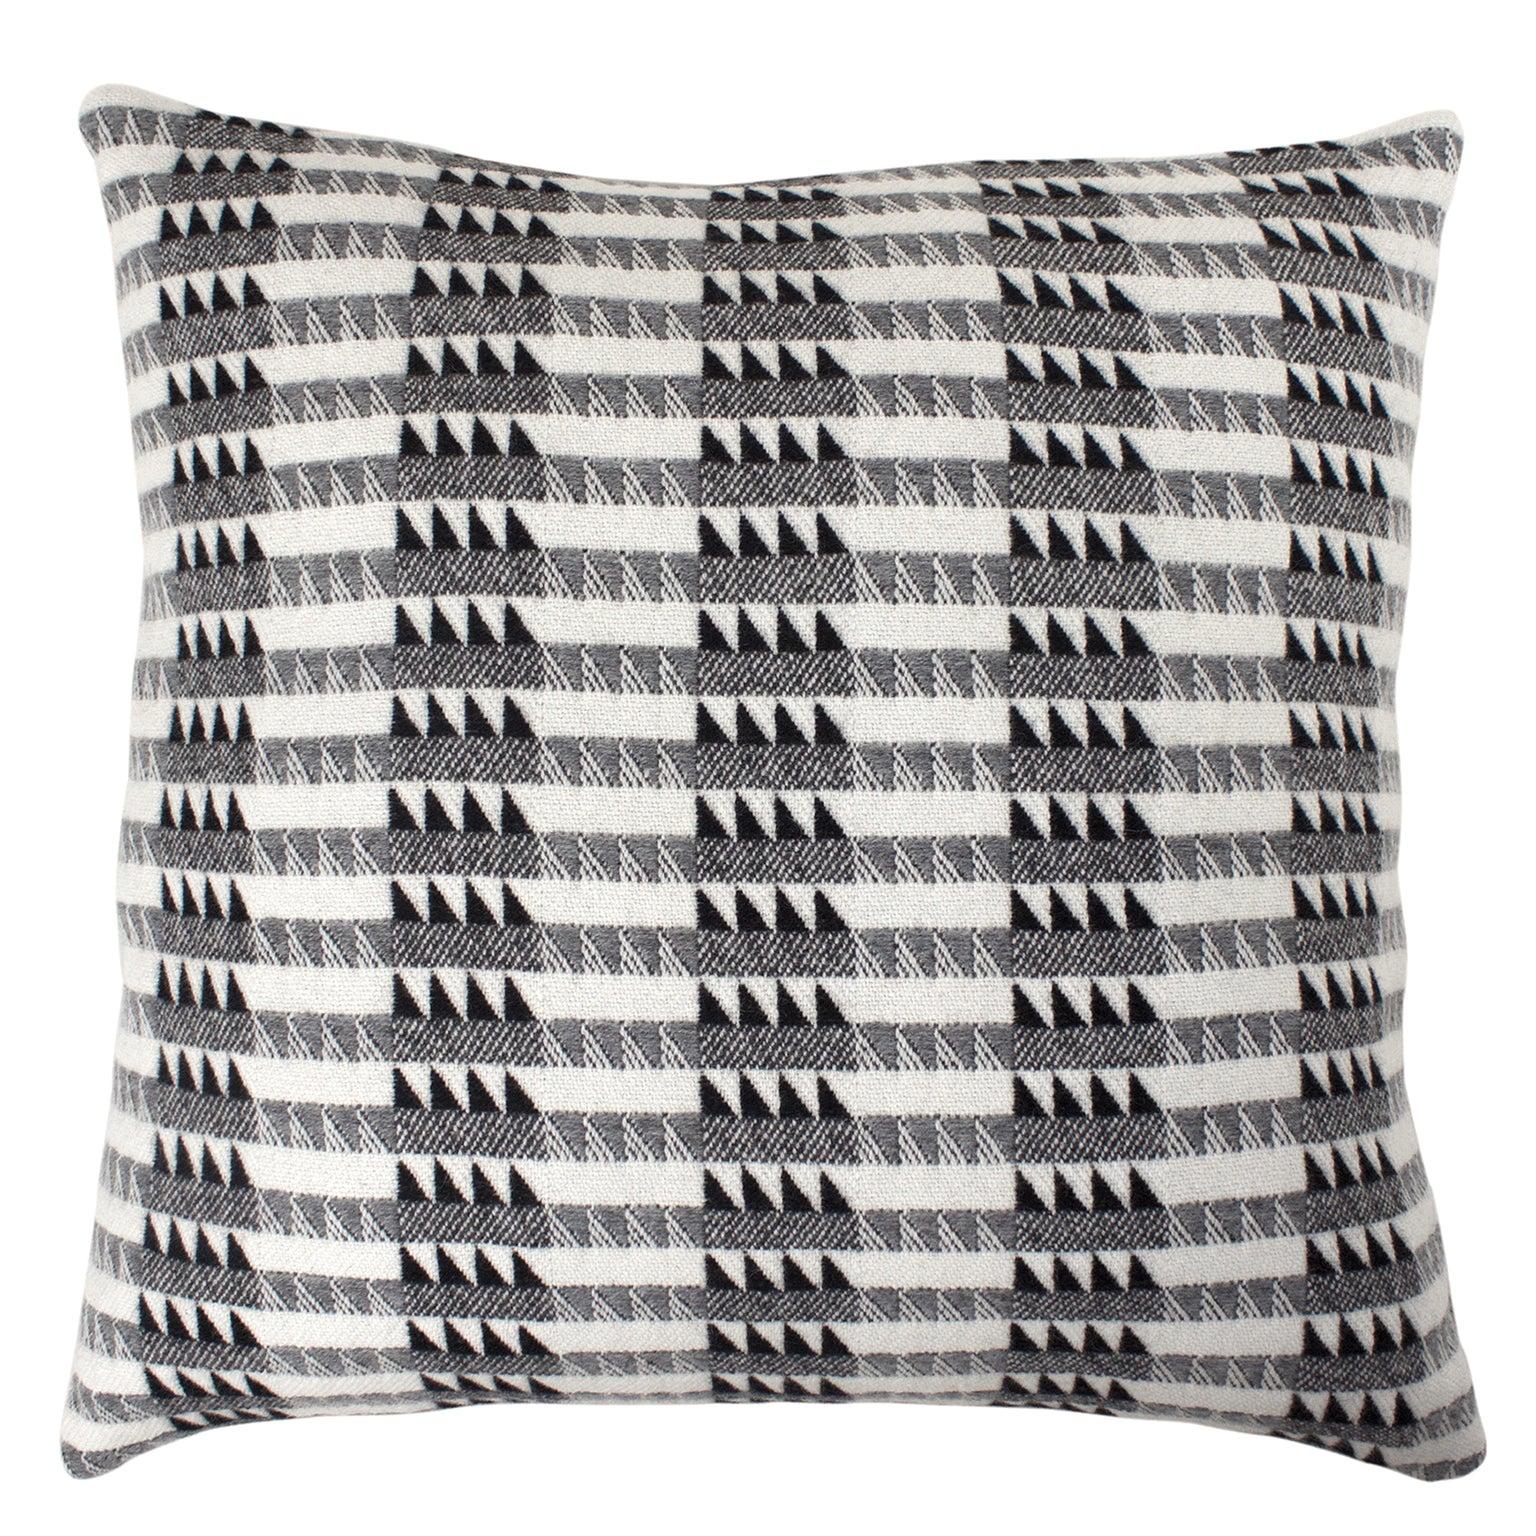 Handwoven 'Ixelles' Geometric Merino Wool Cushion Pillow, Graphite Grey